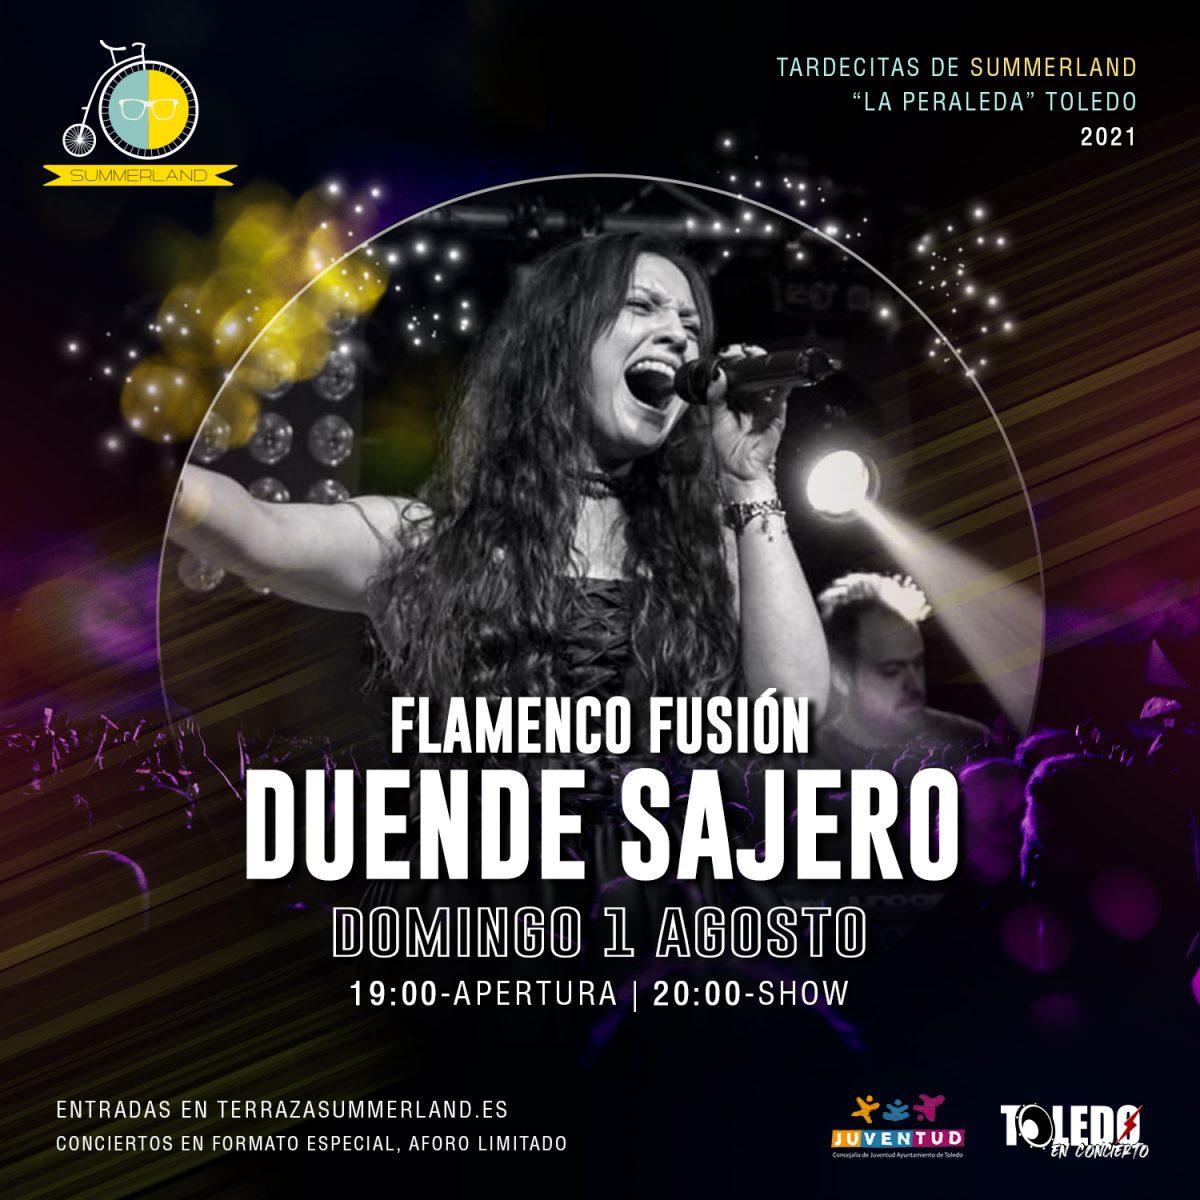 https://www.toledo.es/wp-content/uploads/2021/07/duende-sajero-1200x1200.jpg. Concierto Duende Sajero